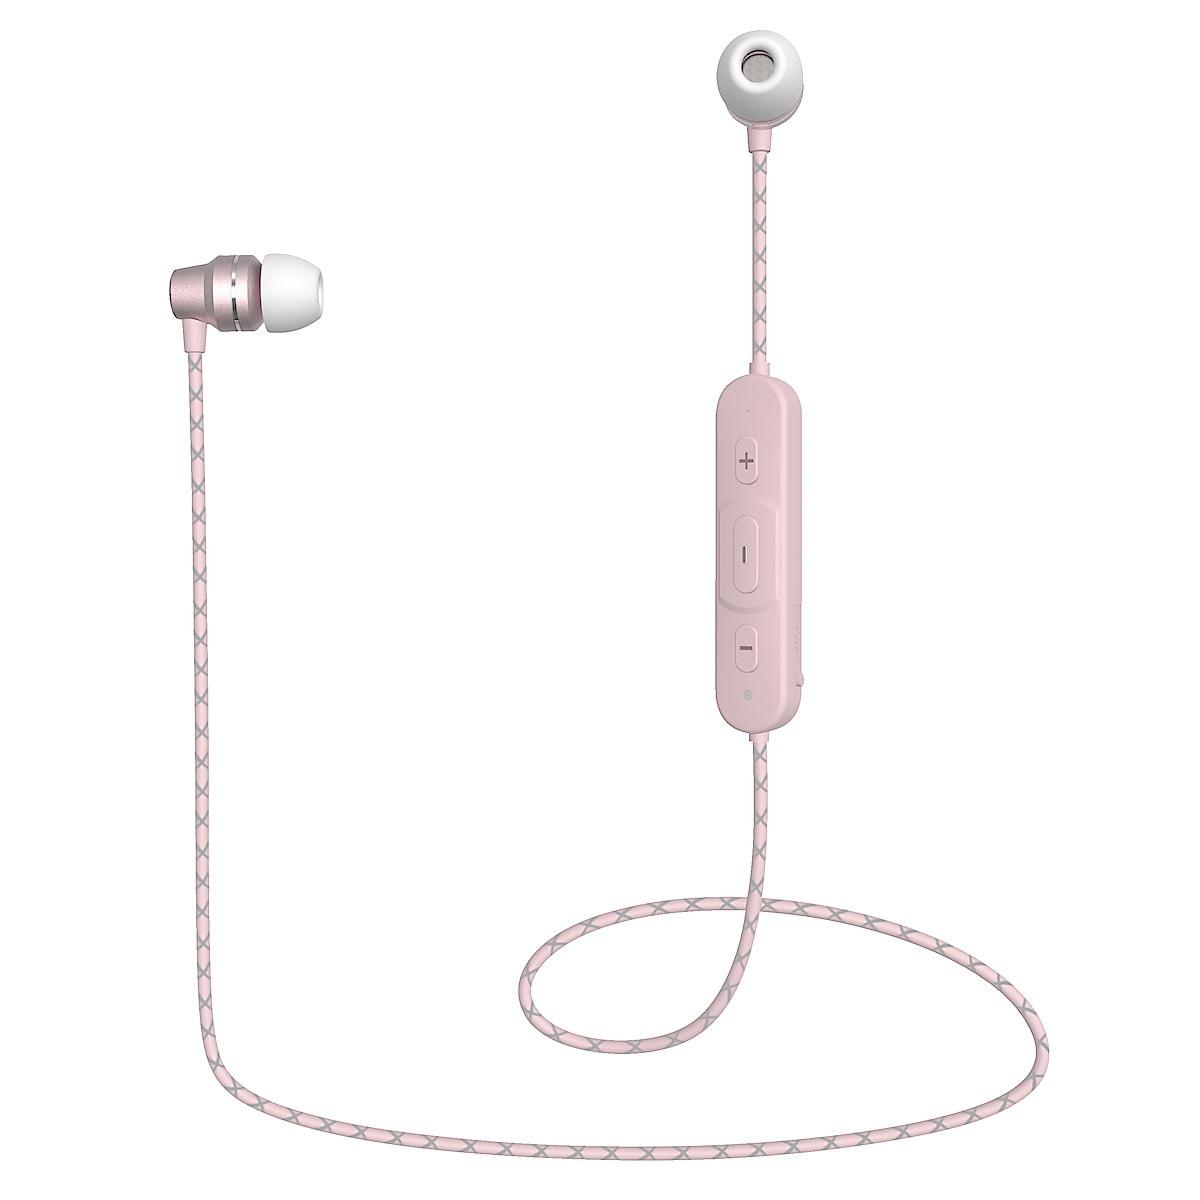 Exibel Boninite Wireless Earphones with Microphone